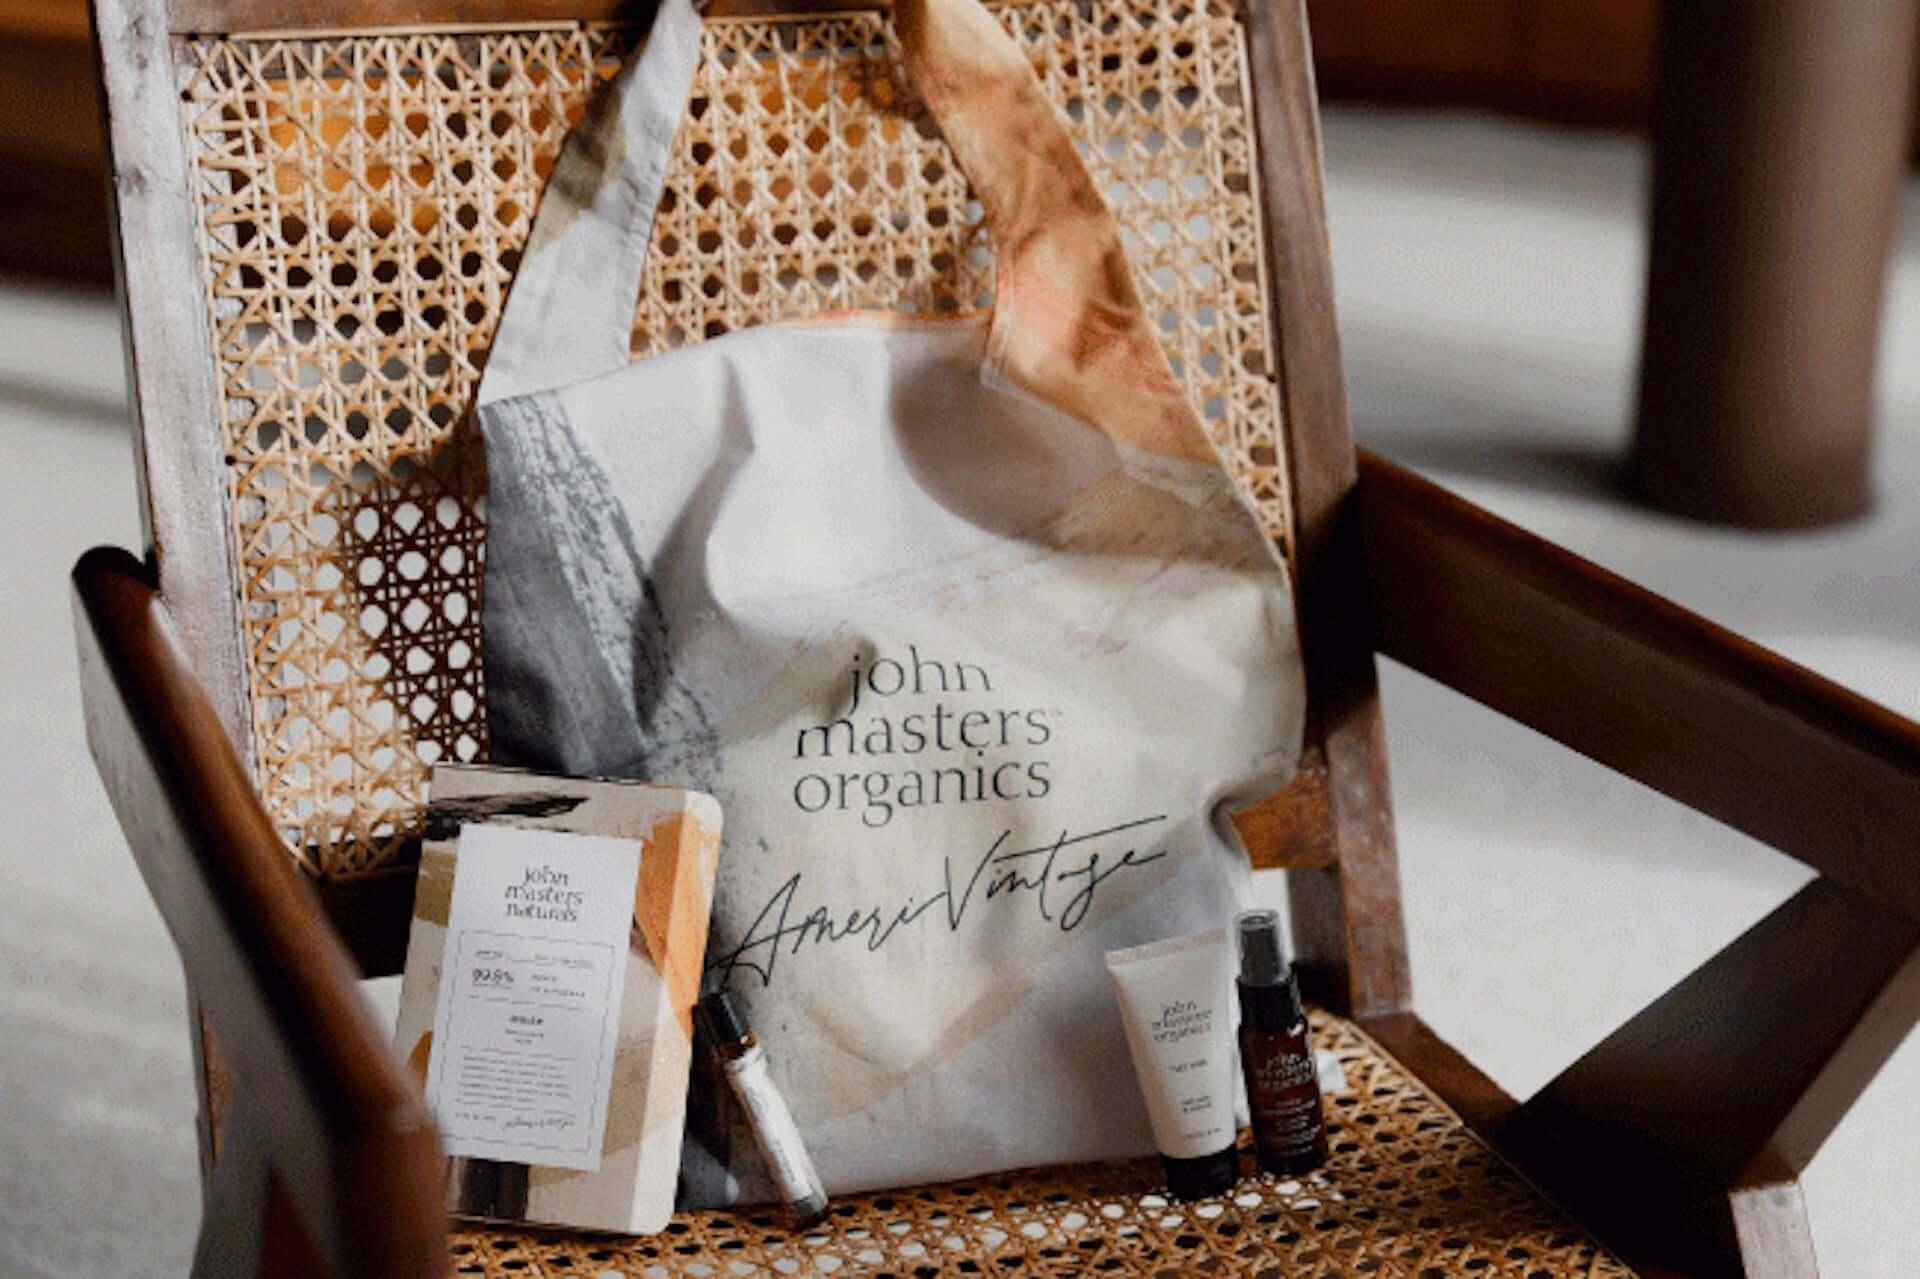 john masters organicsとAmeri VINTAGEのコラボフレグランスが数量限定で発売決定!オレンジとバニラの香りをブレンド lf210202_johnmasters-amerivintage_2-1920x1279